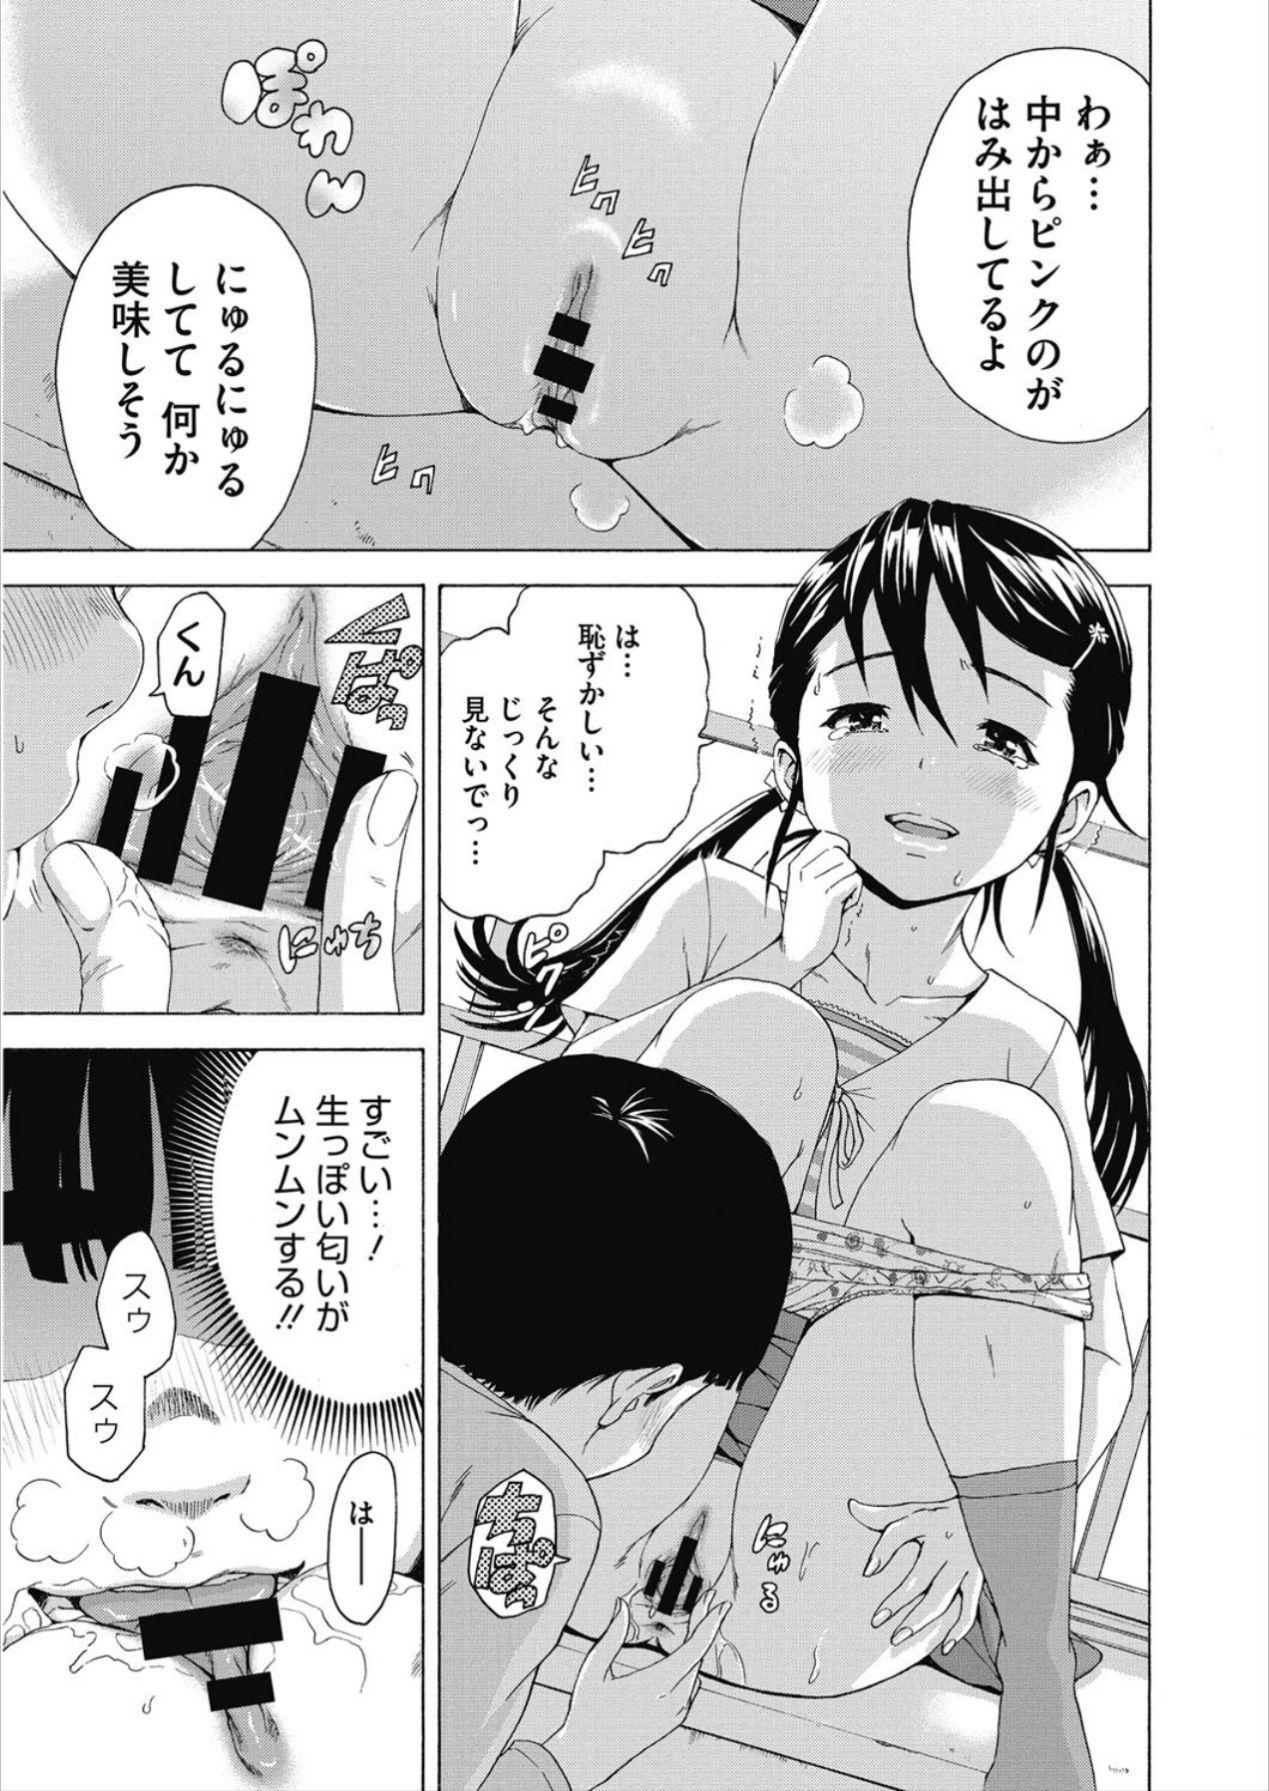 [Anthology] LQ -Little Queen- Vol. 21 [Digital] 178